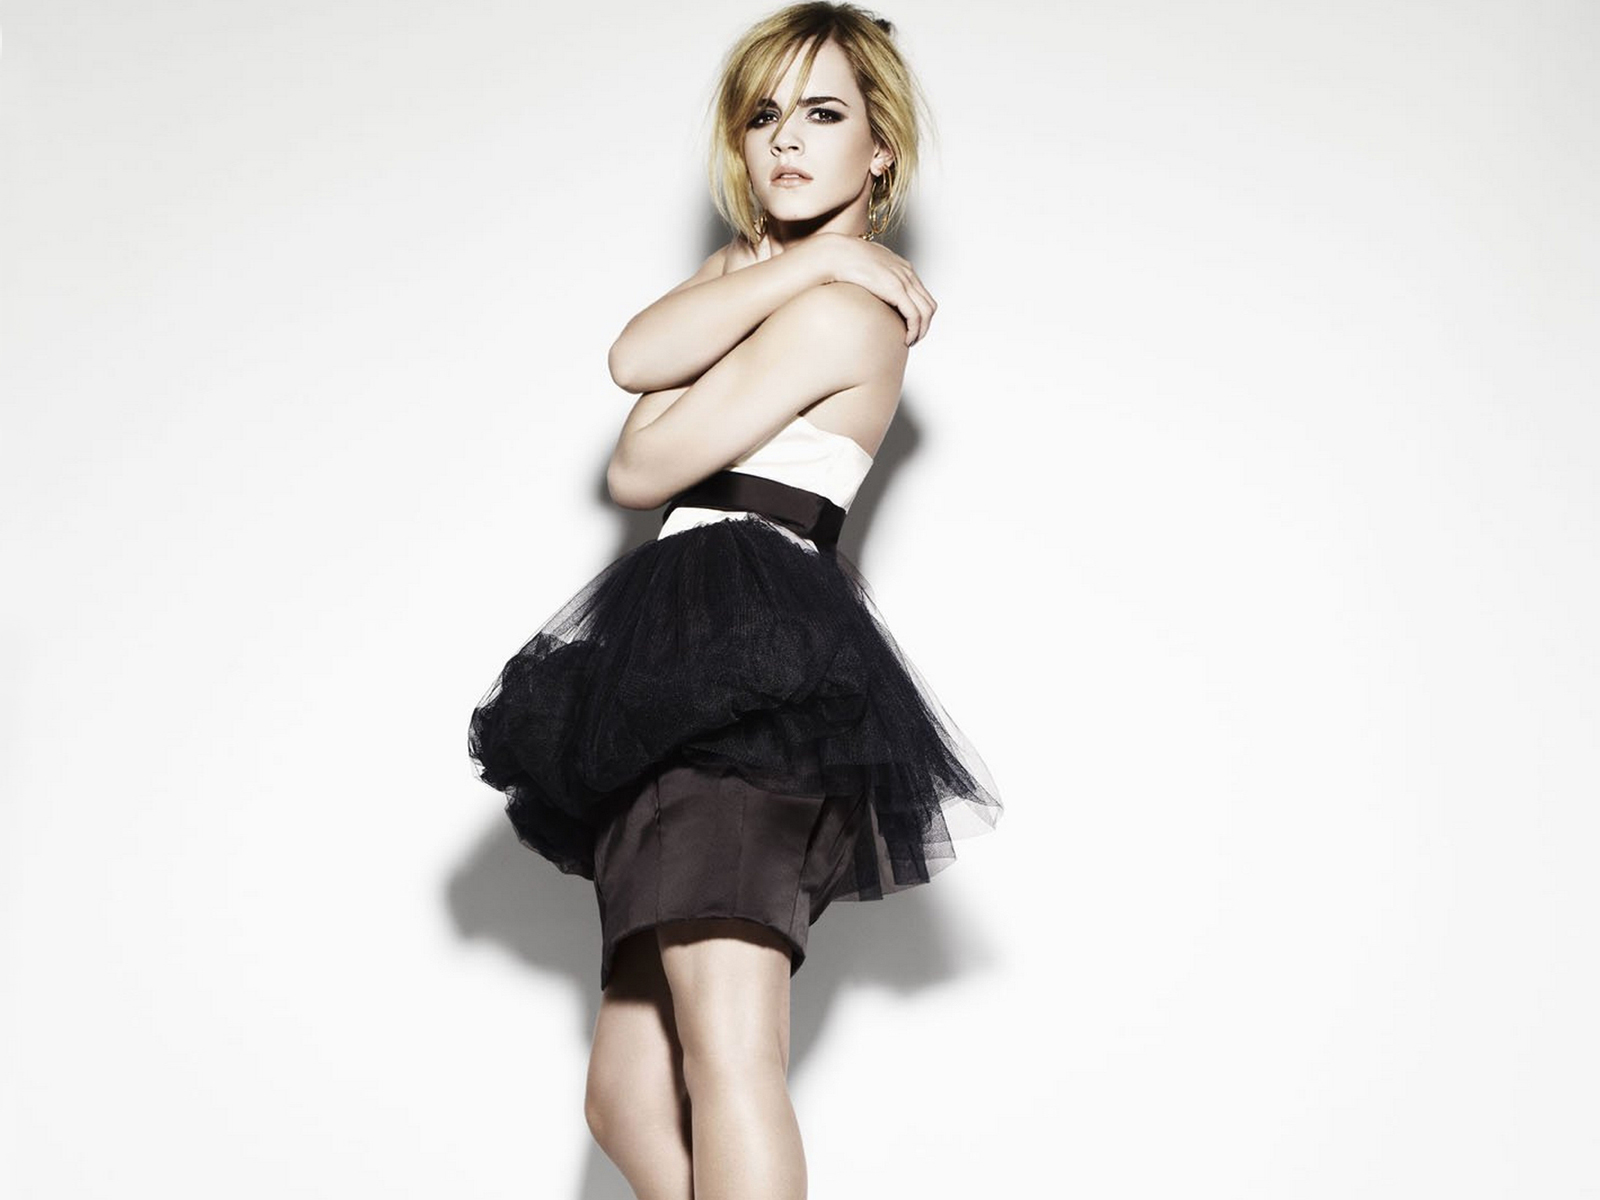 Emma Watson 260 wallpaper download